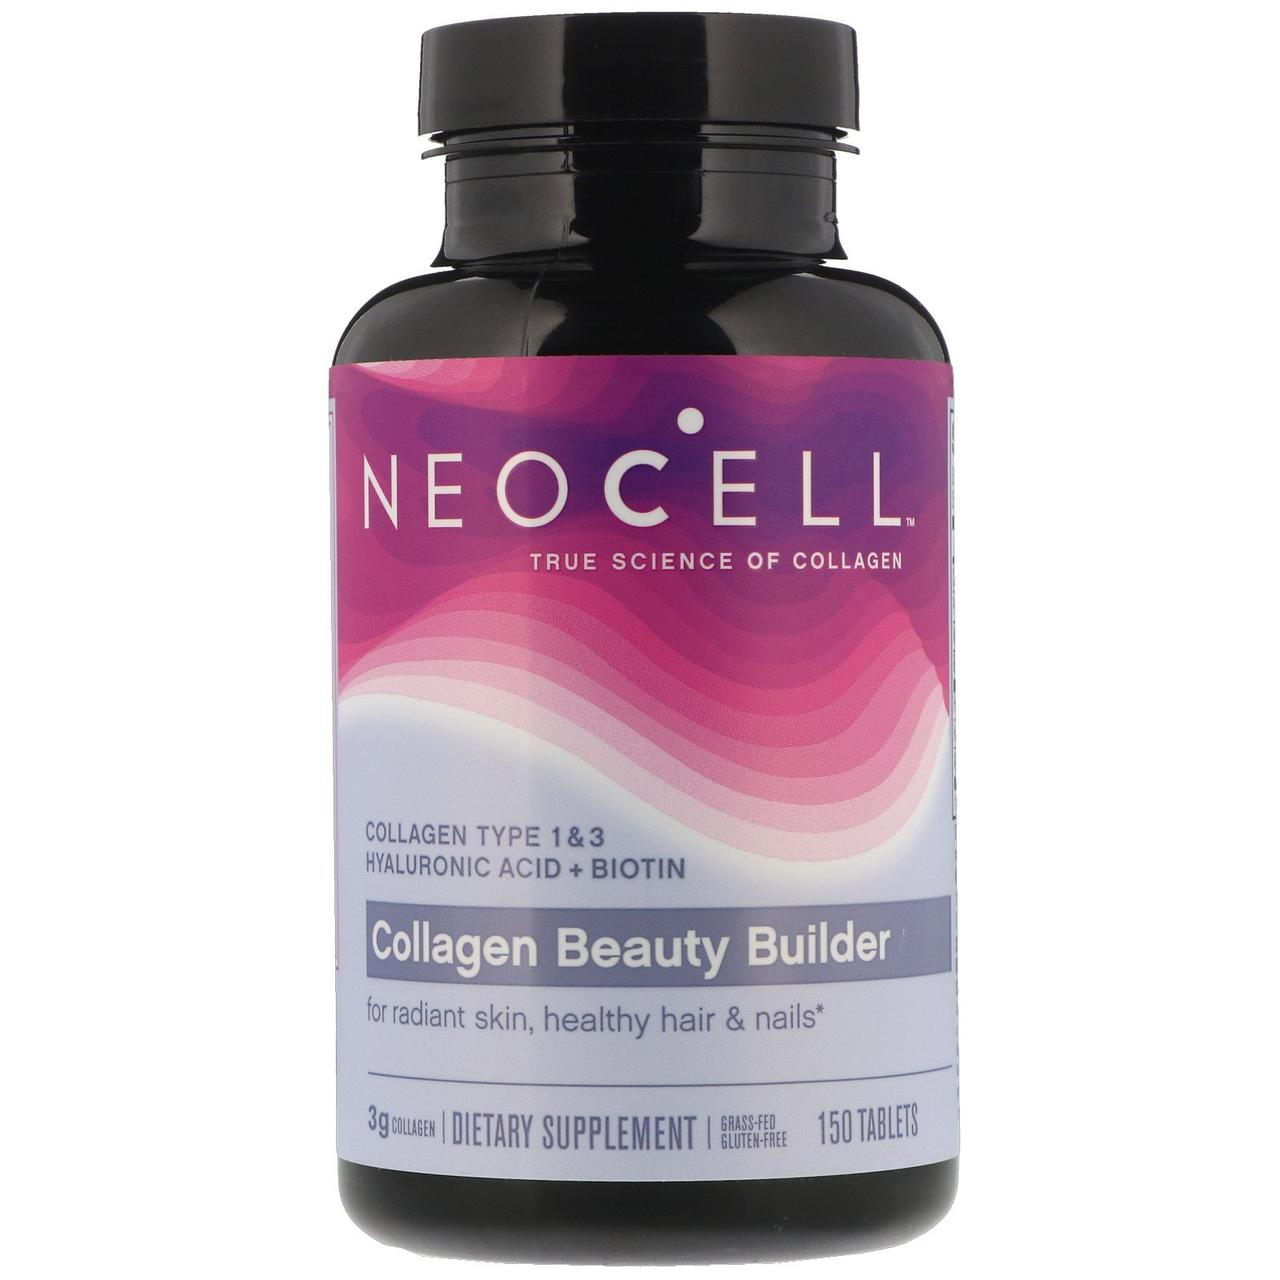 Коллаген Neocell 3000 мг с гиалуроной кислотой (30 мг) и вит.С, Collagen Beauty Builder, 150 таблеток